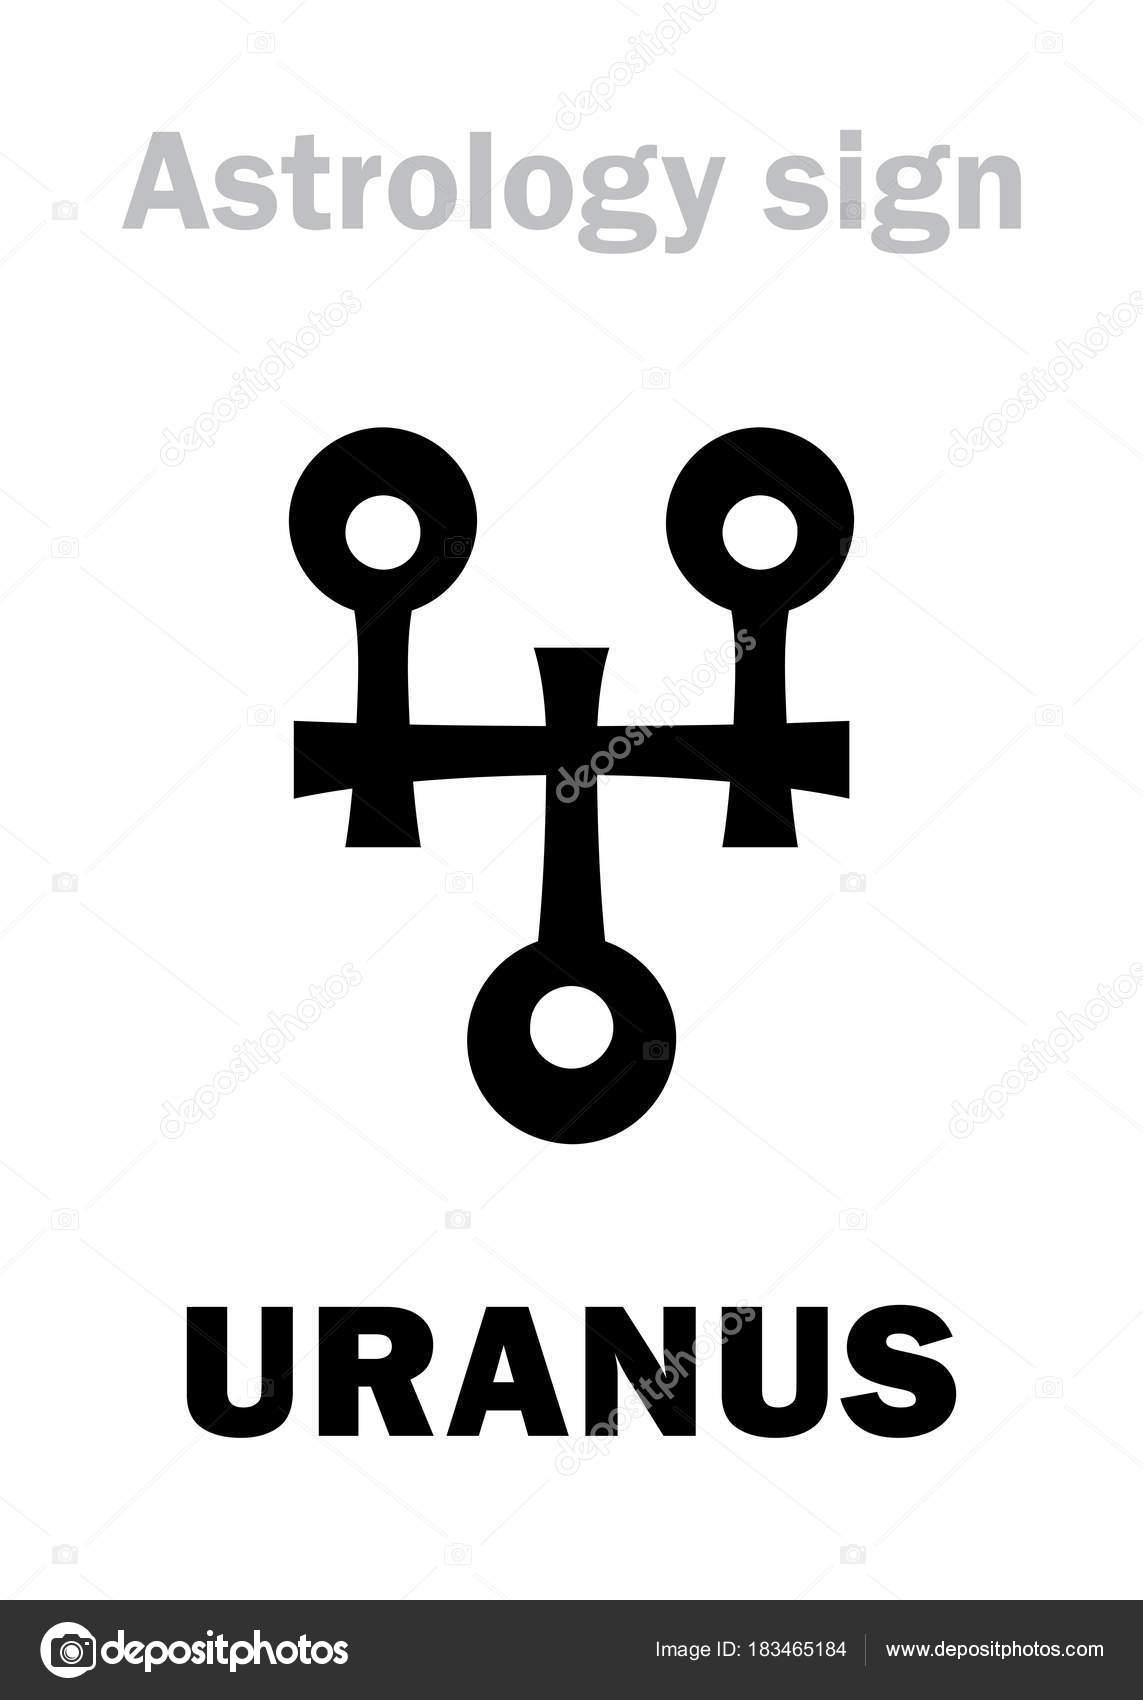 Black symbols astrology planets vector infiltration treatment diagram astrology planet uranus stock vector photon 183465184 depositphotos 183465184 stock illustration astrology planet buycottarizona